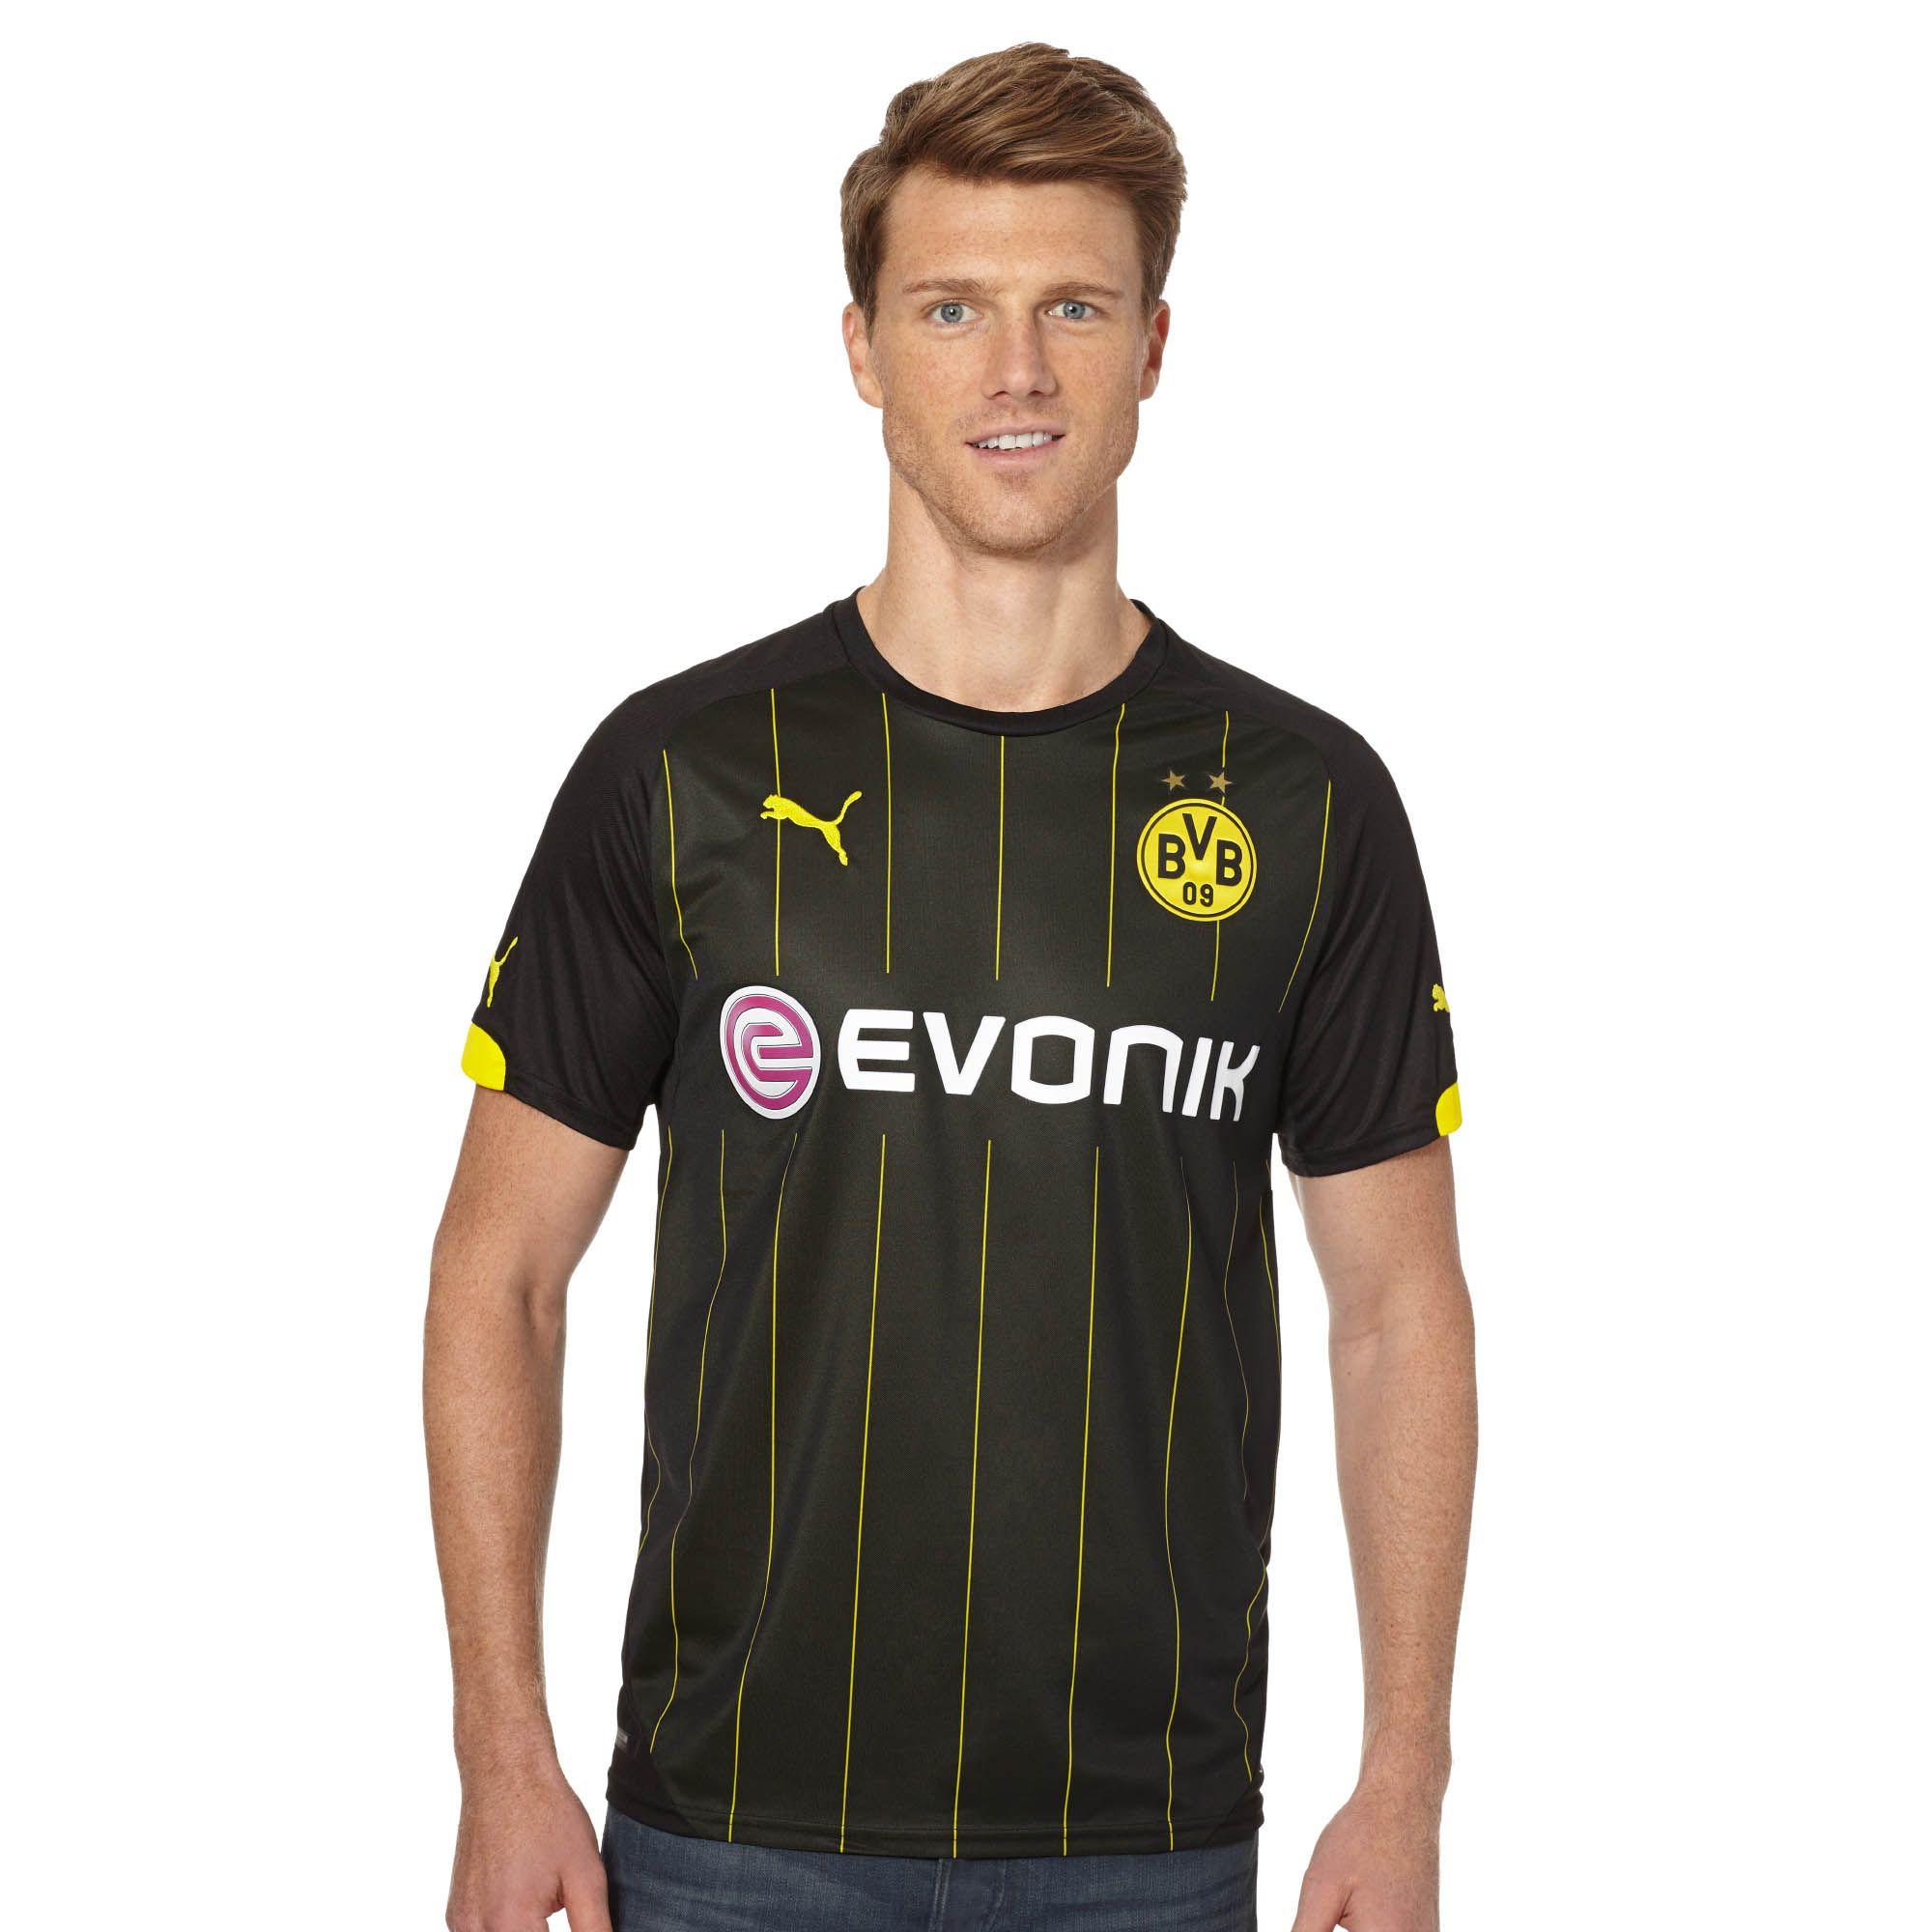 Image of 2015/16 Borussia Dortmund Away Replica Jersey